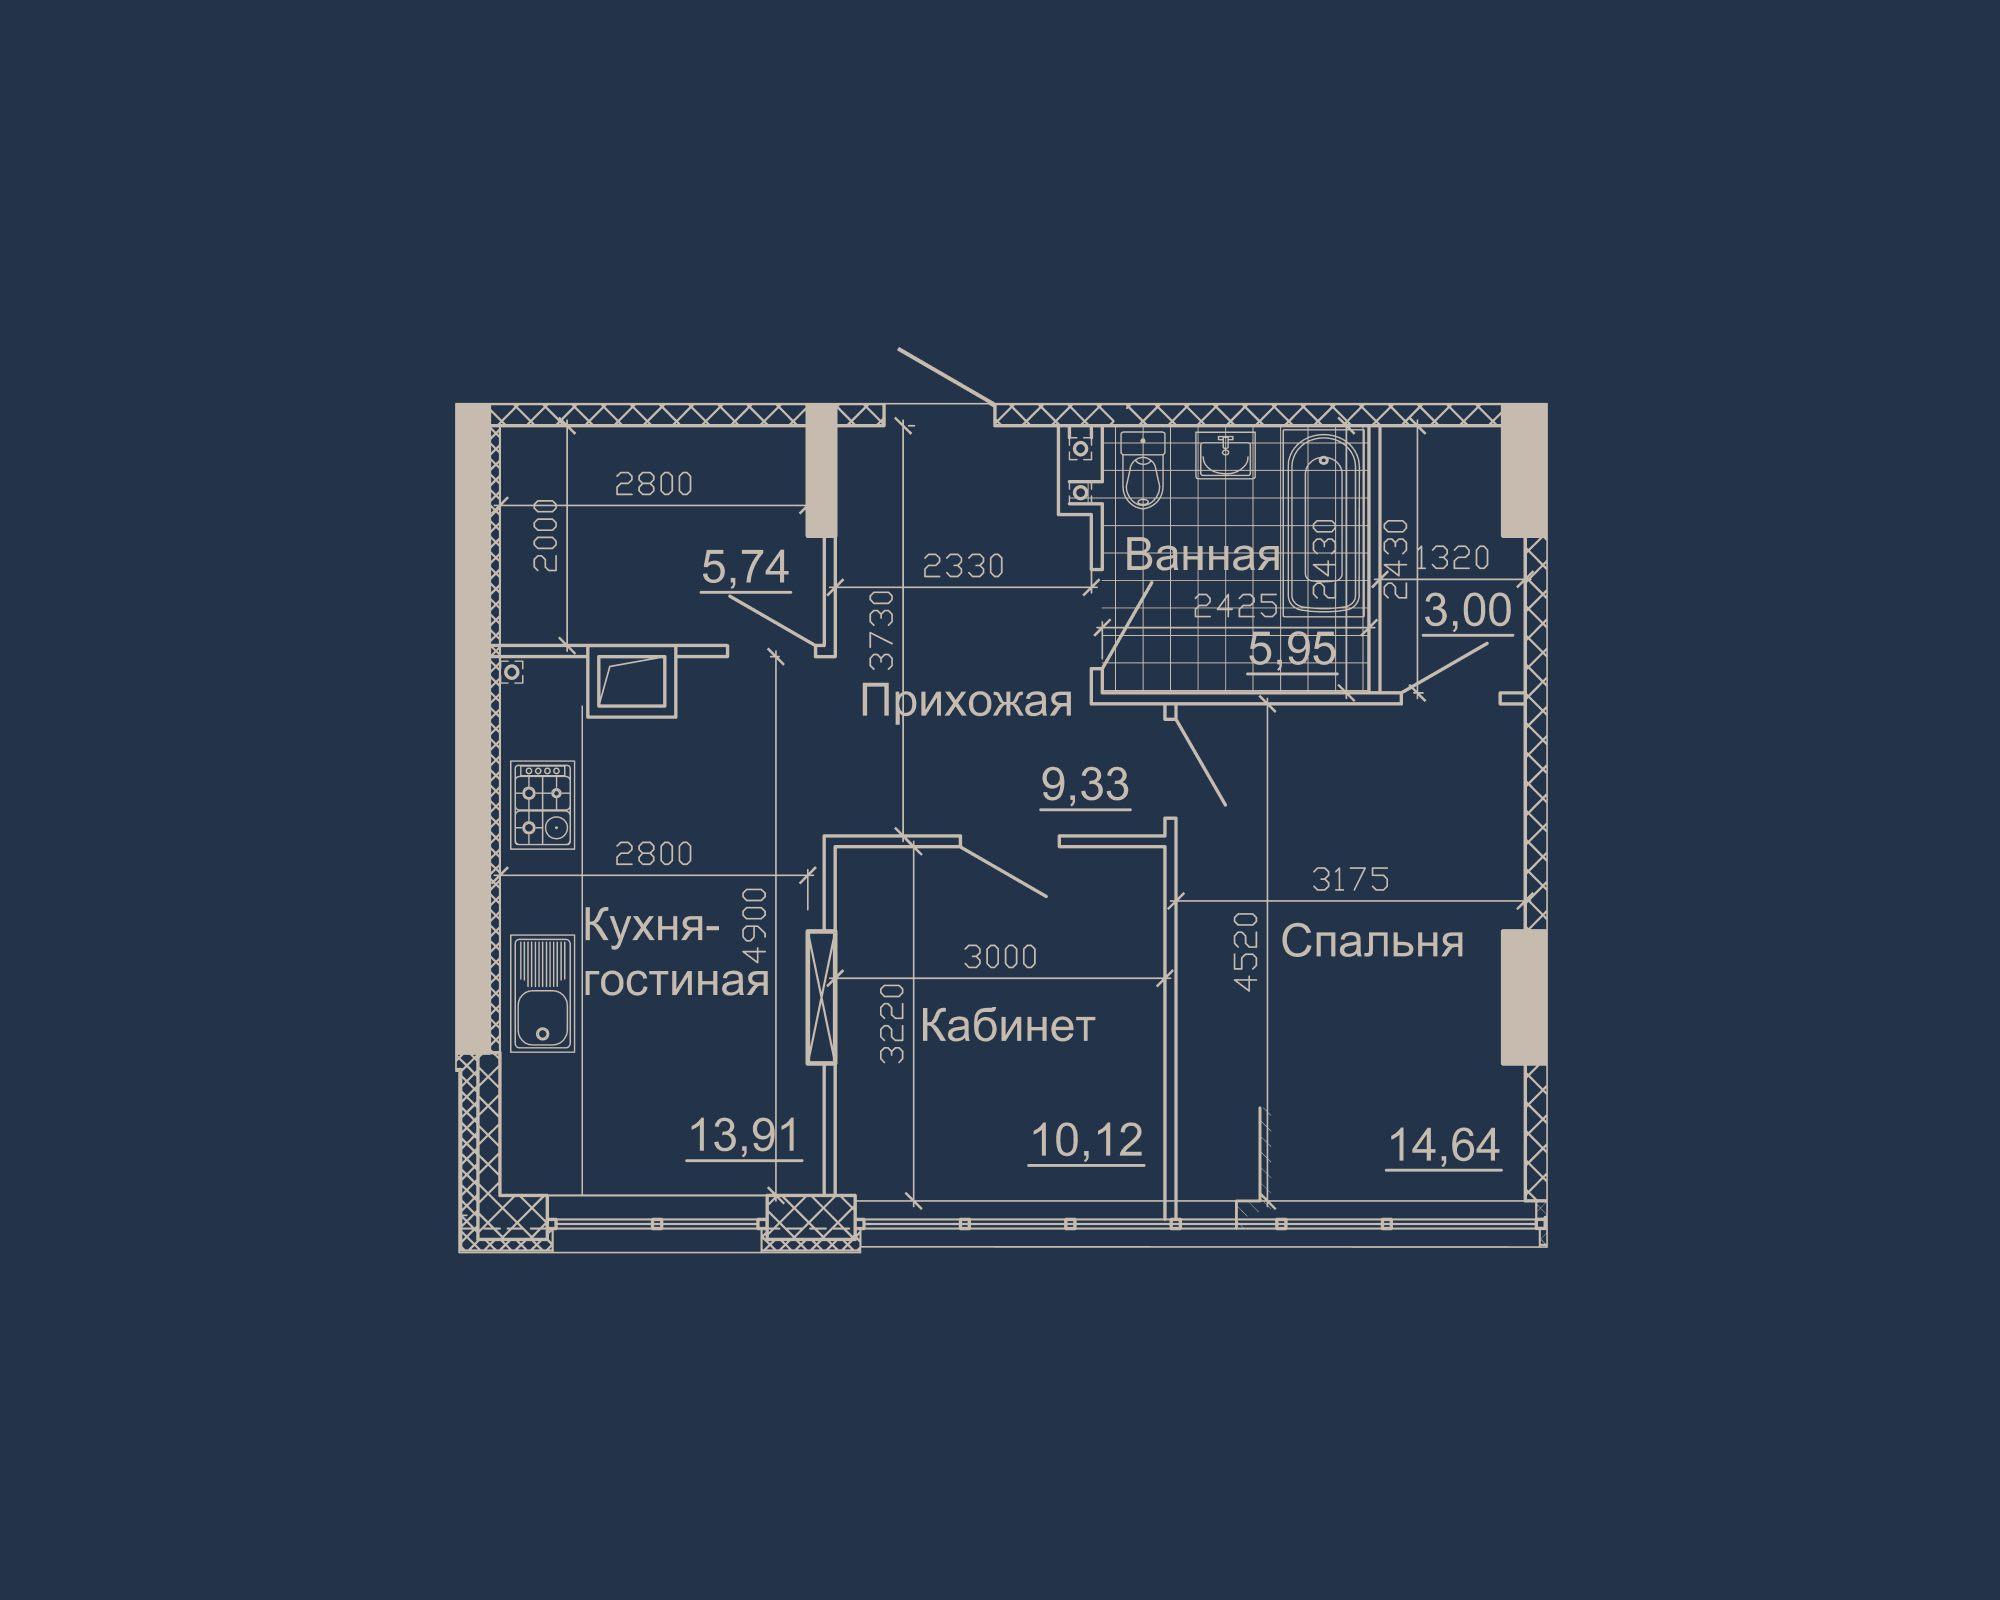 2-кімнатна квартира типу 10А-2 у ЖК Nebo